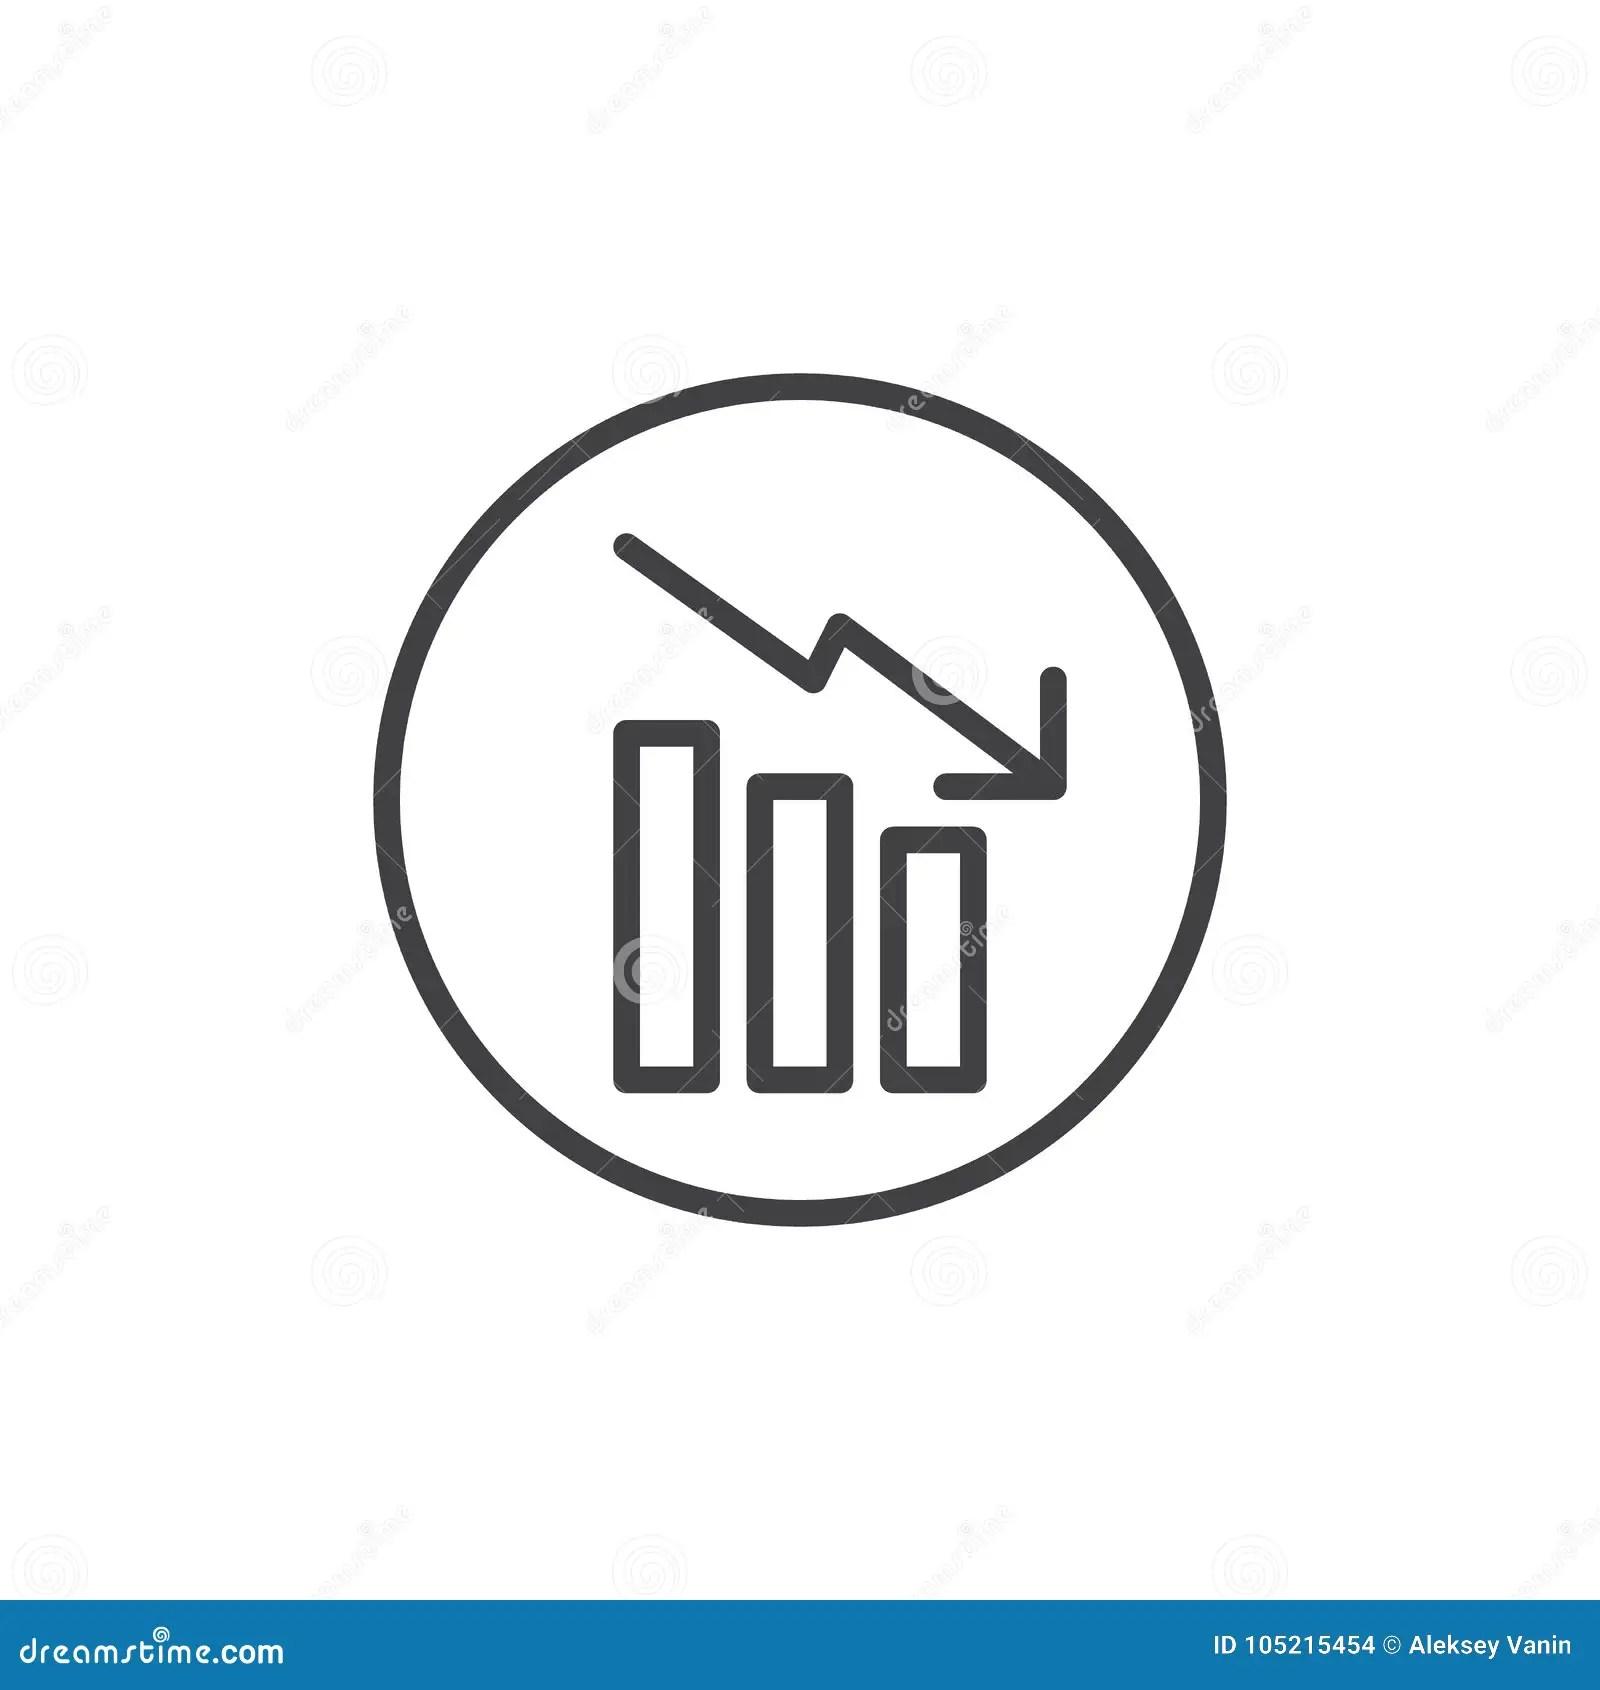 Decrease Graph Line Icon Stock Vector Illustration Of